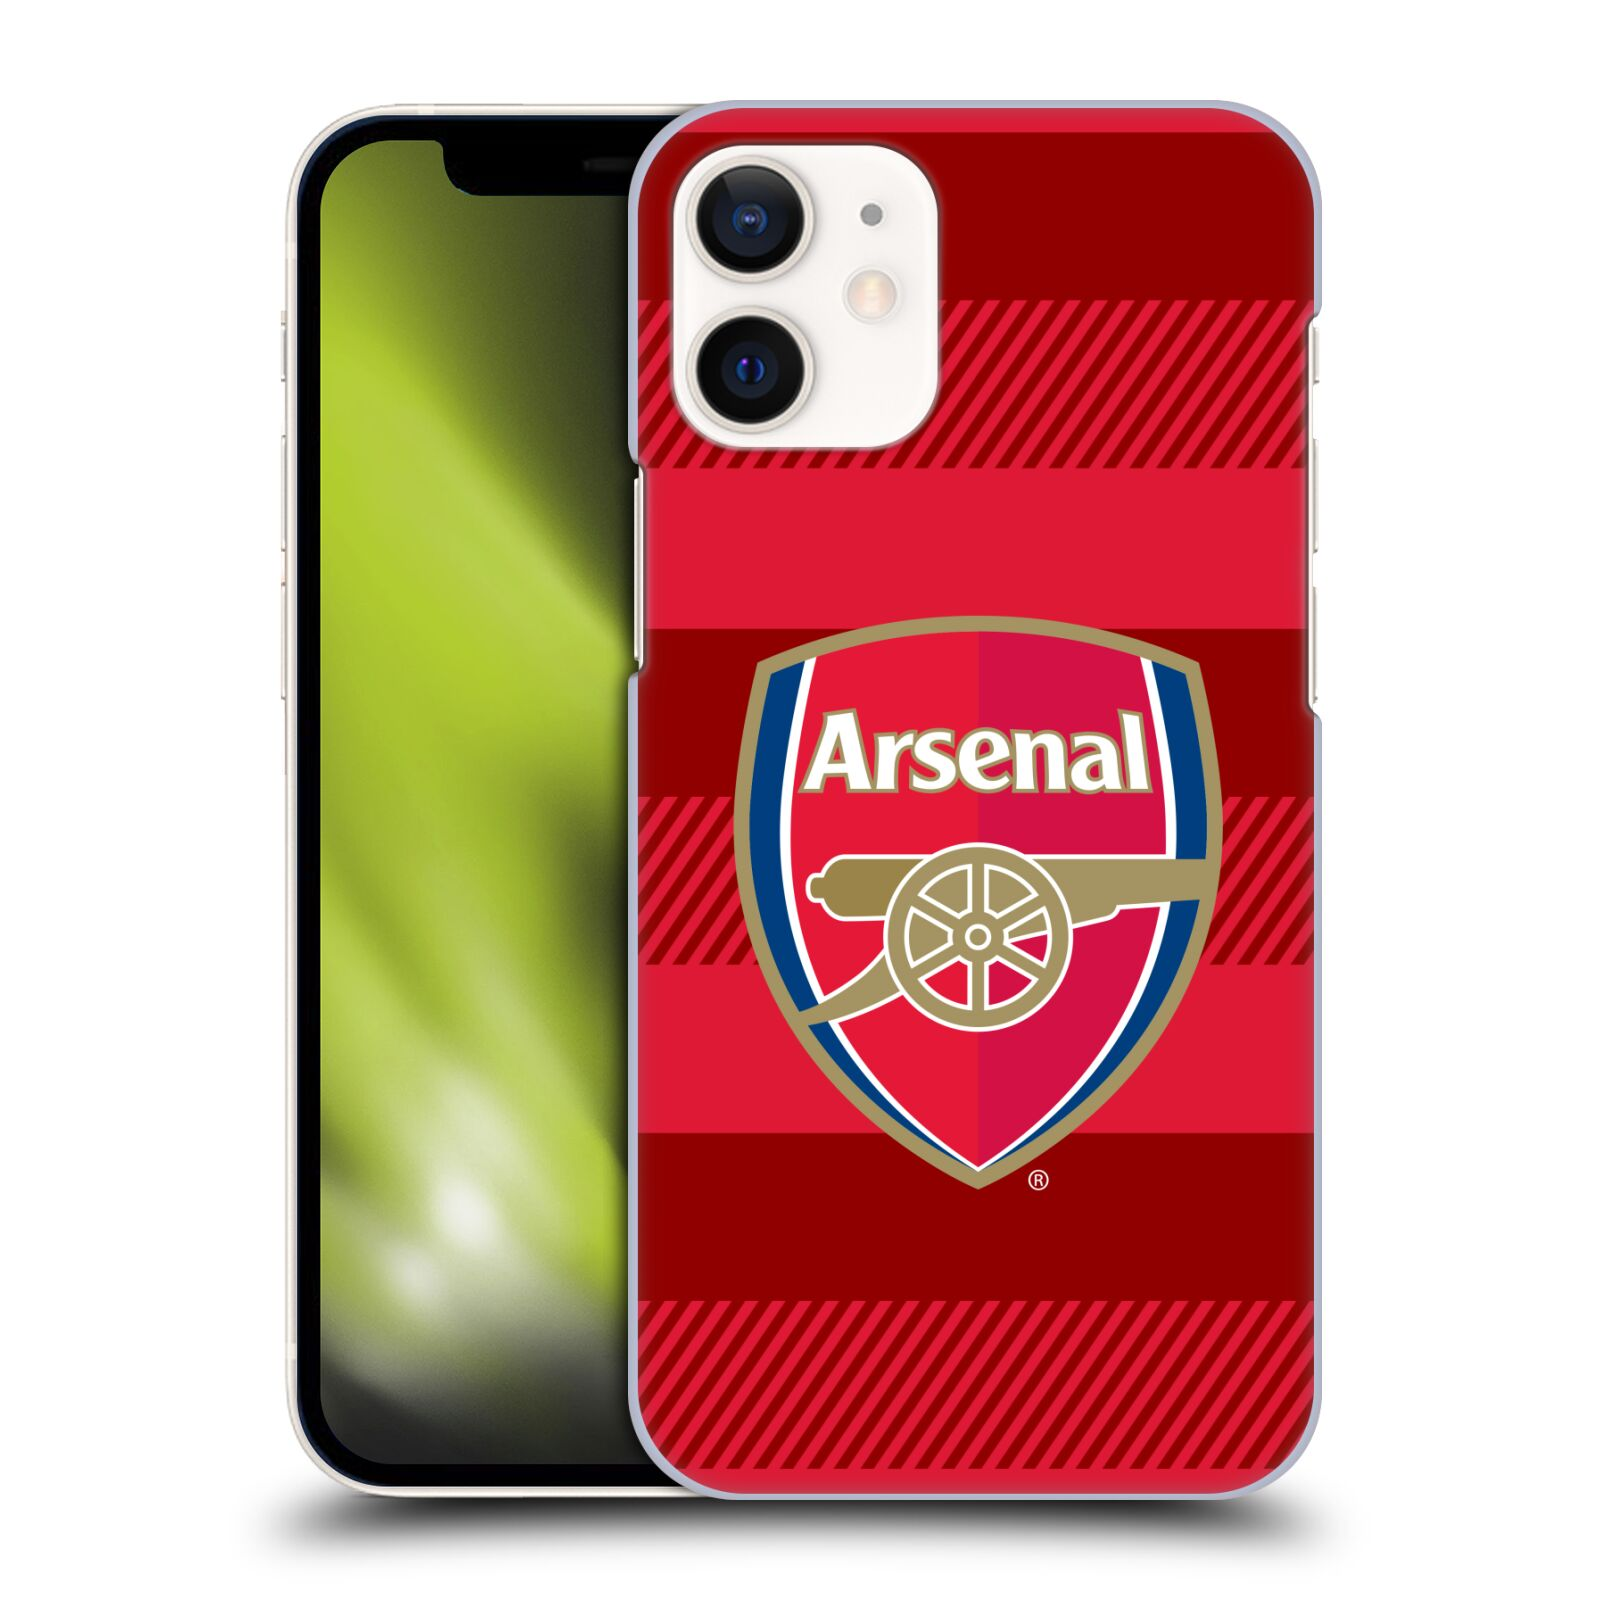 Plastové pouzdro na mobil Apple iPhone 12 Mini - Head Case - Arsenal FC - Logo s pruhy